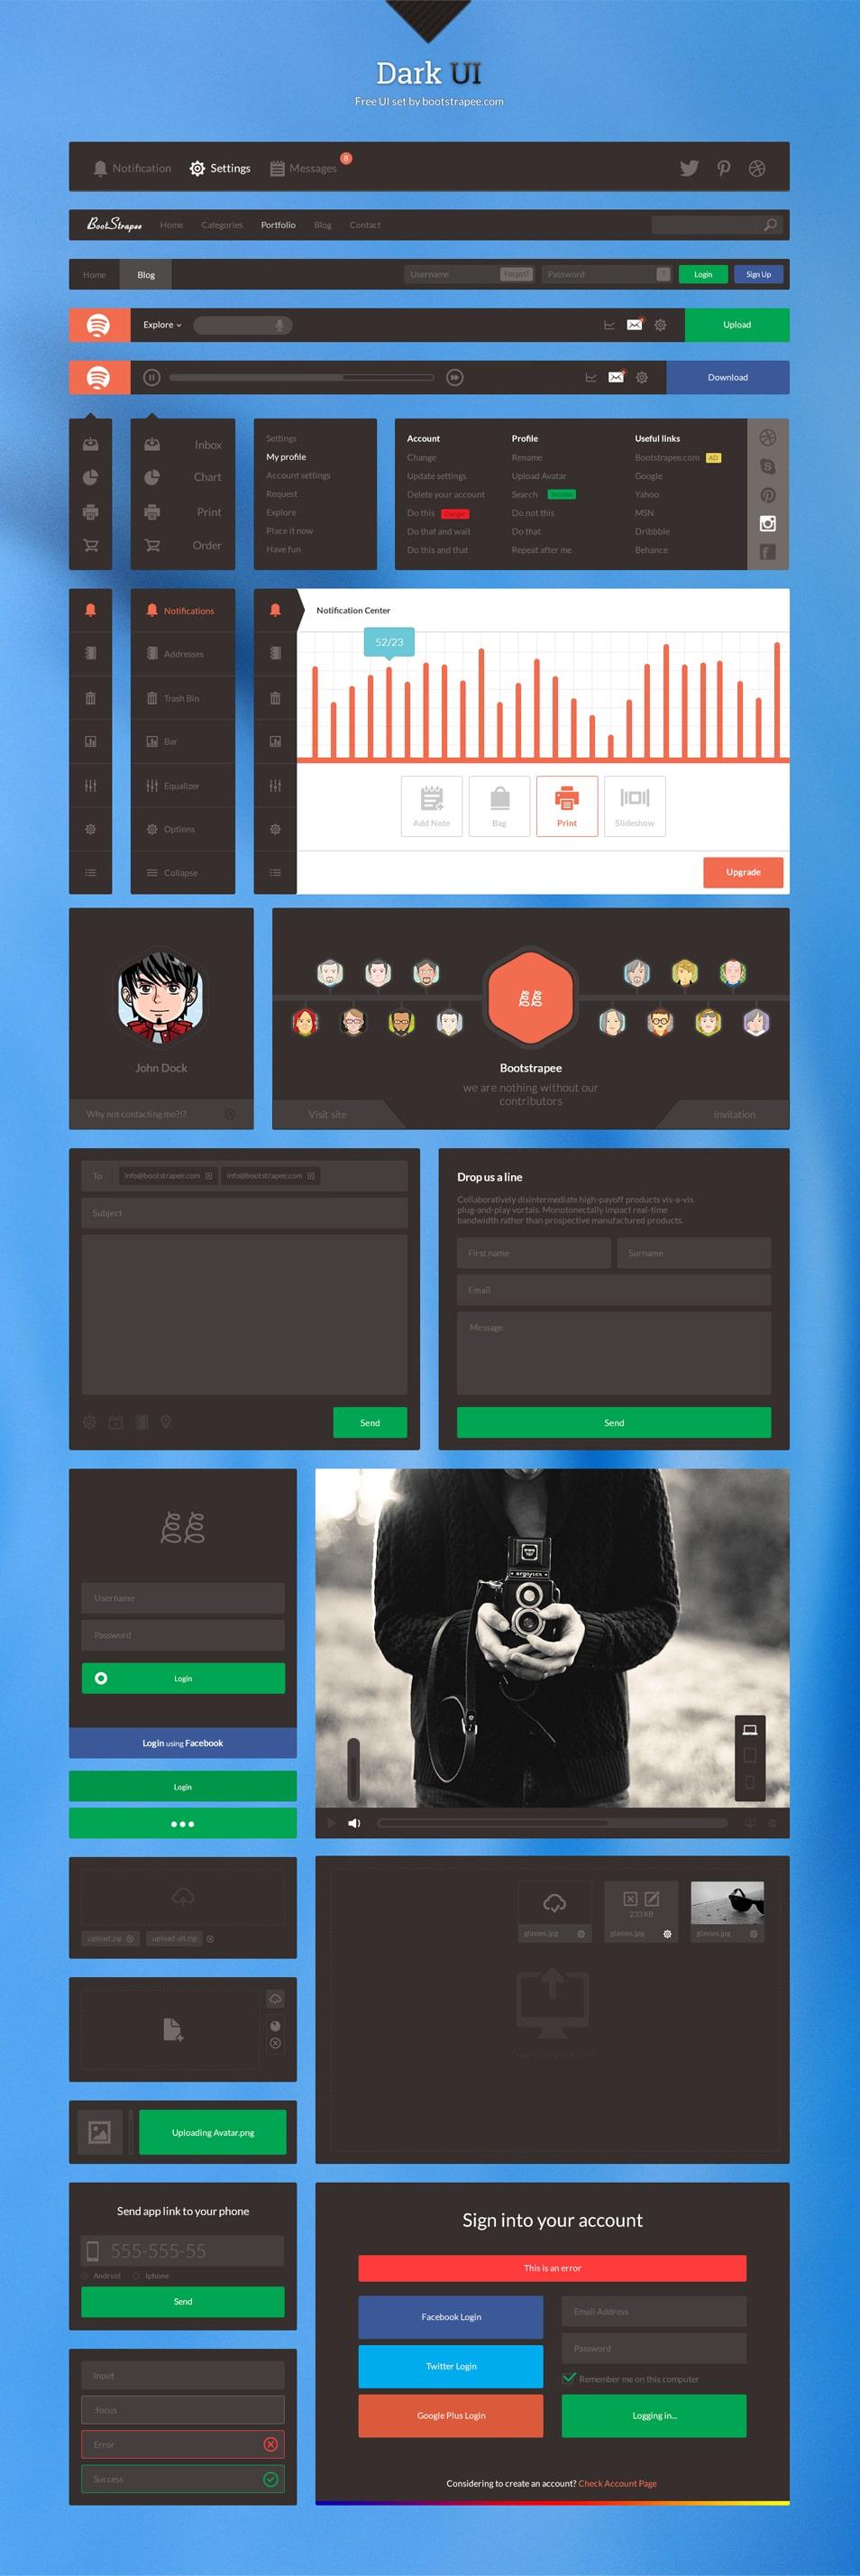 Free Dark UI Set